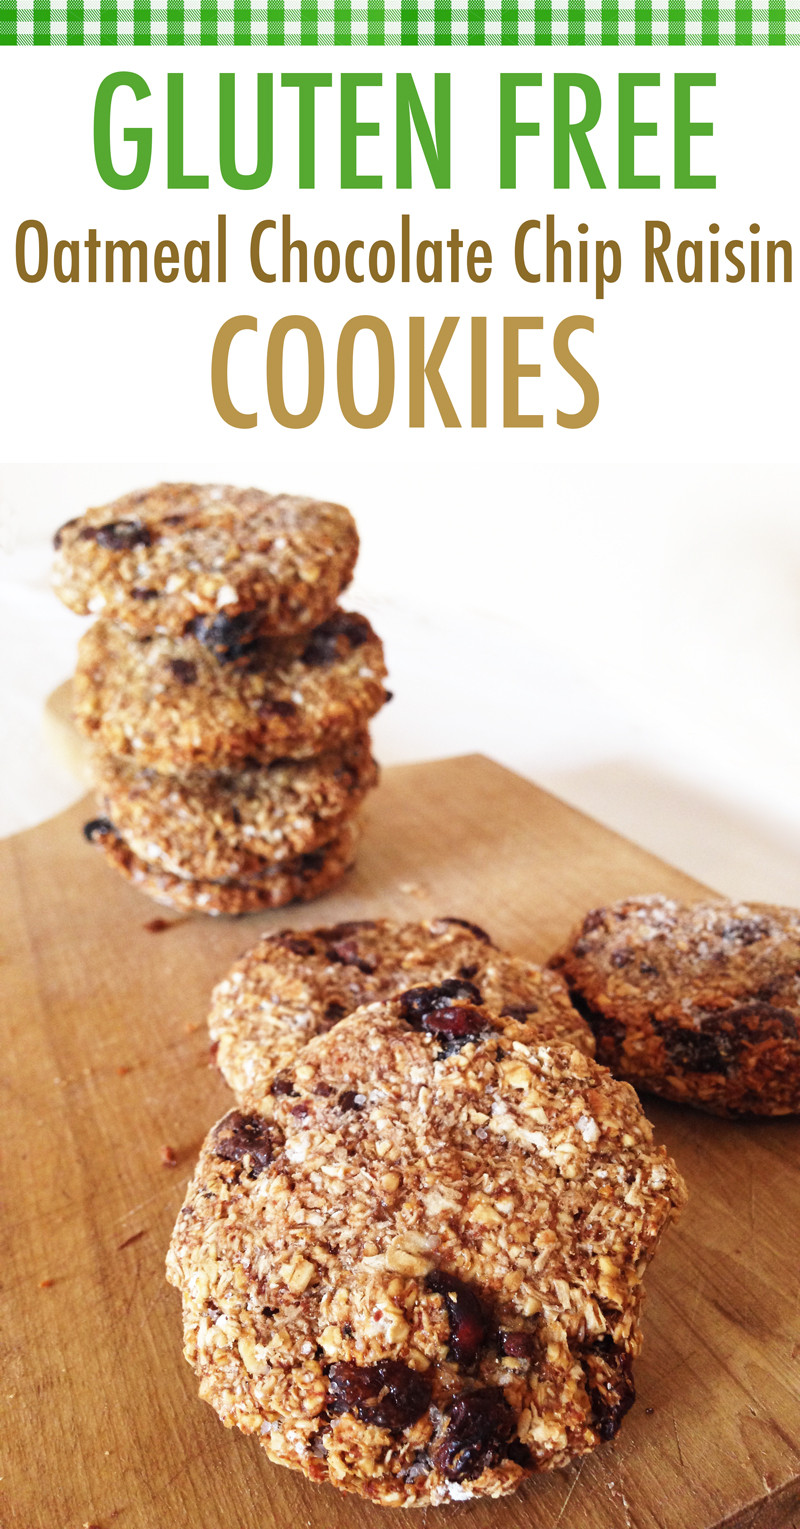 Gluten Free Oatmeal Chocolate Chip Cookies  Suzy Q Author at Better Baking BibleBetter Baking Bible